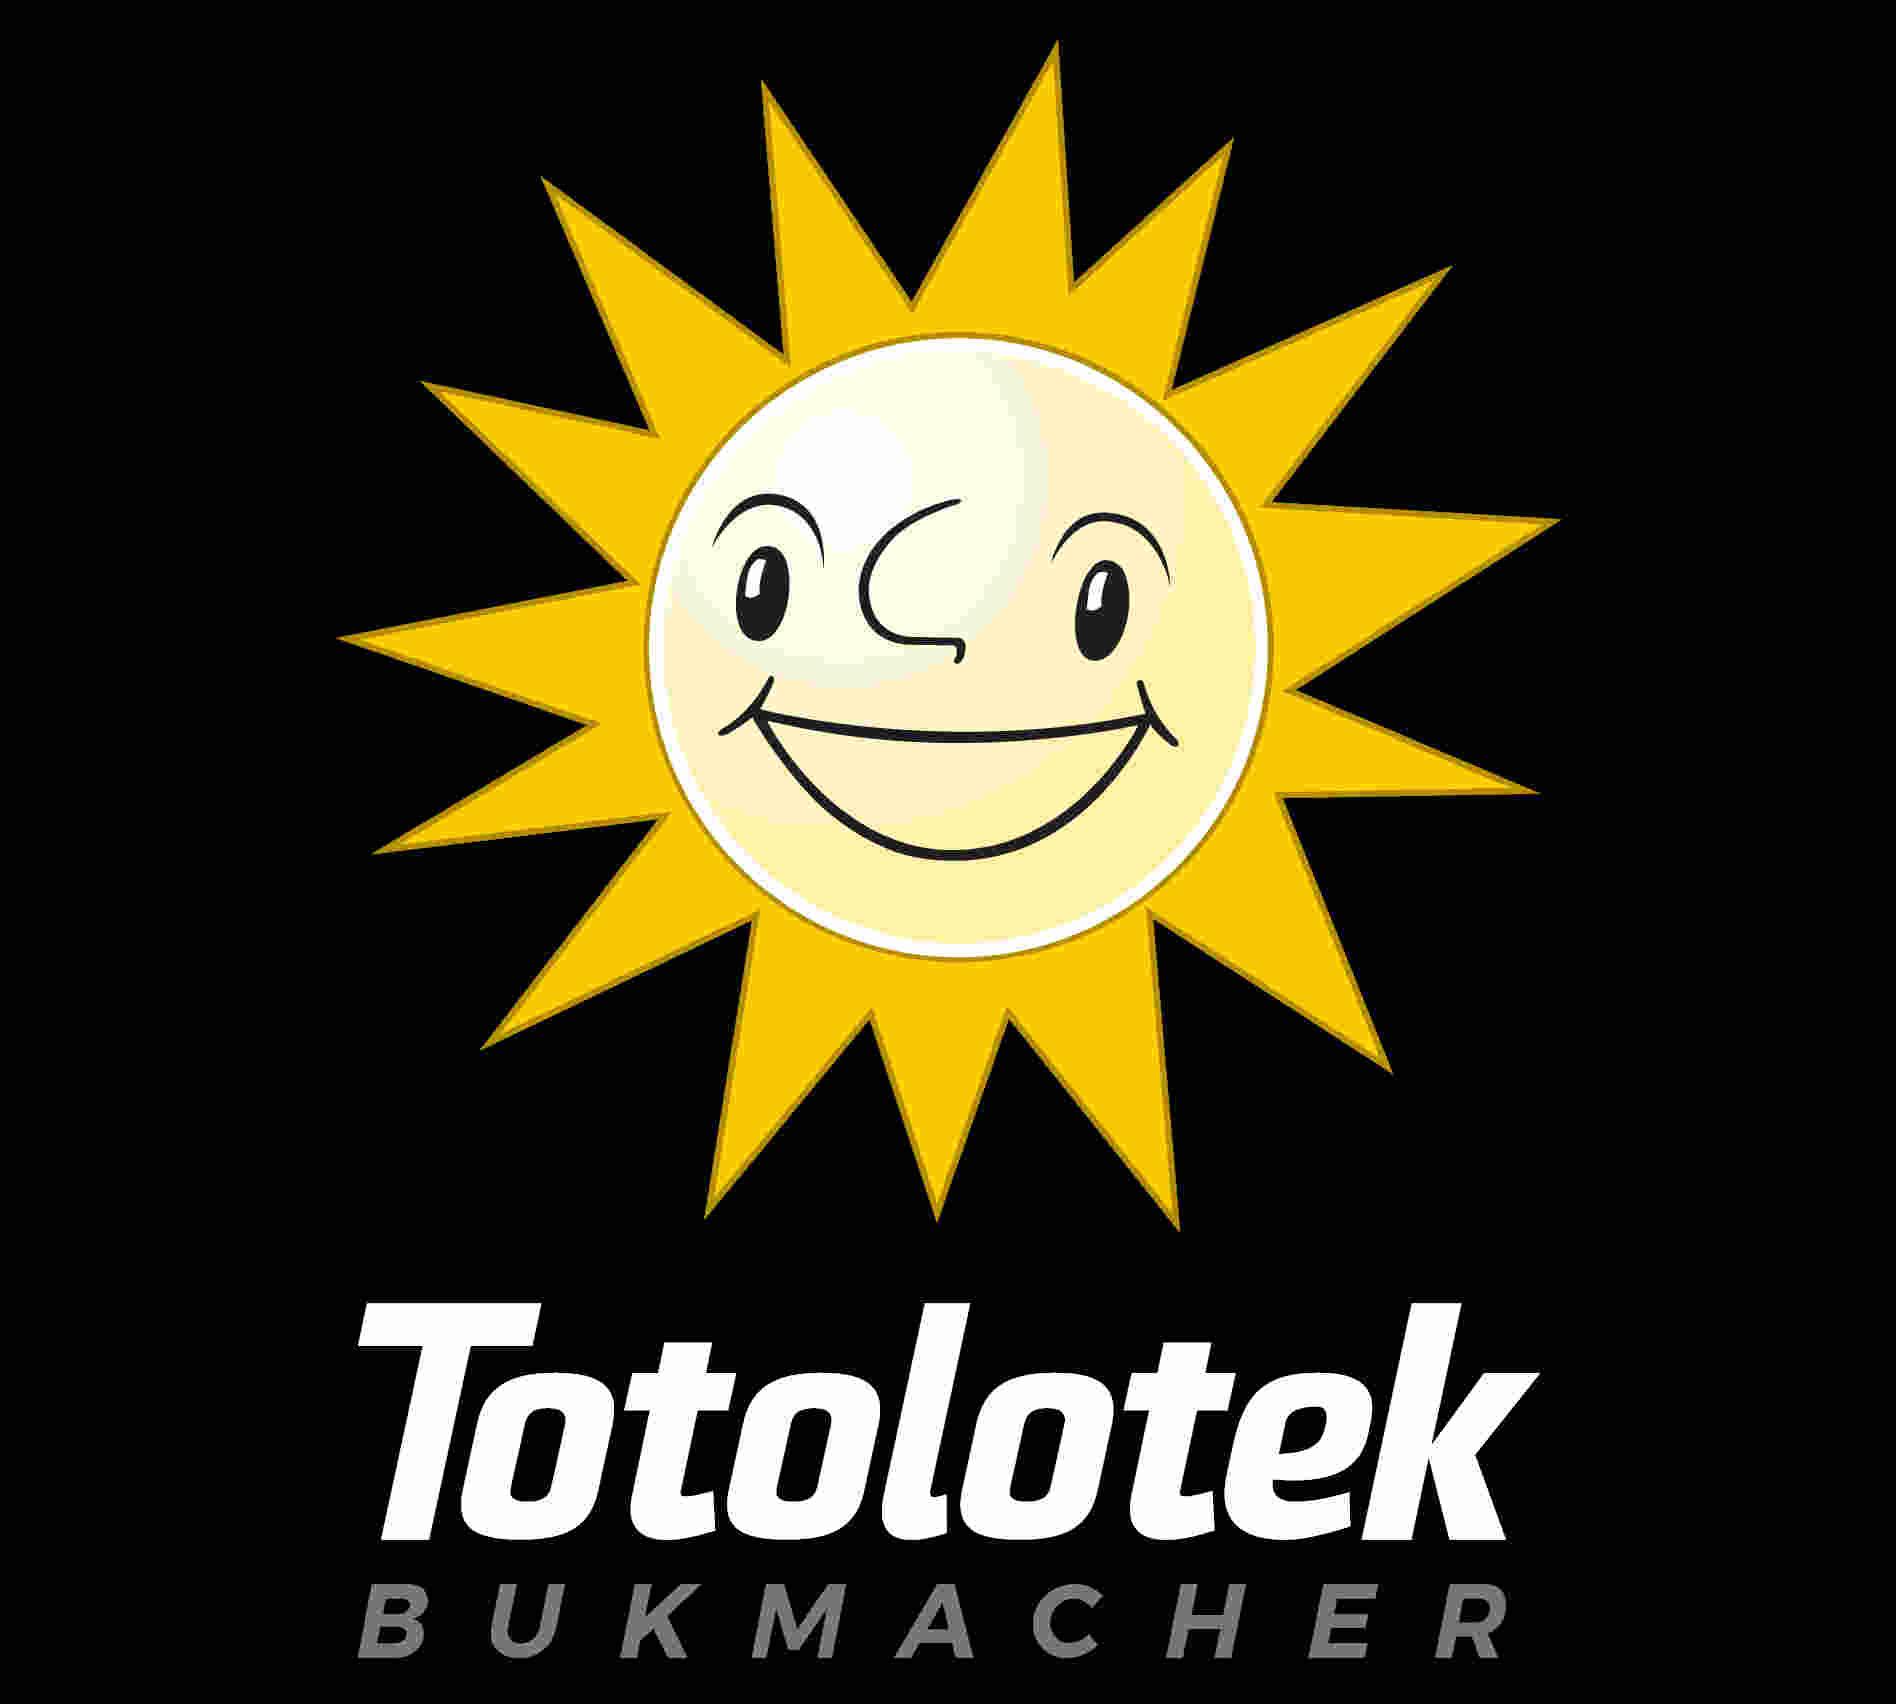 Totolotek-Bukmacher